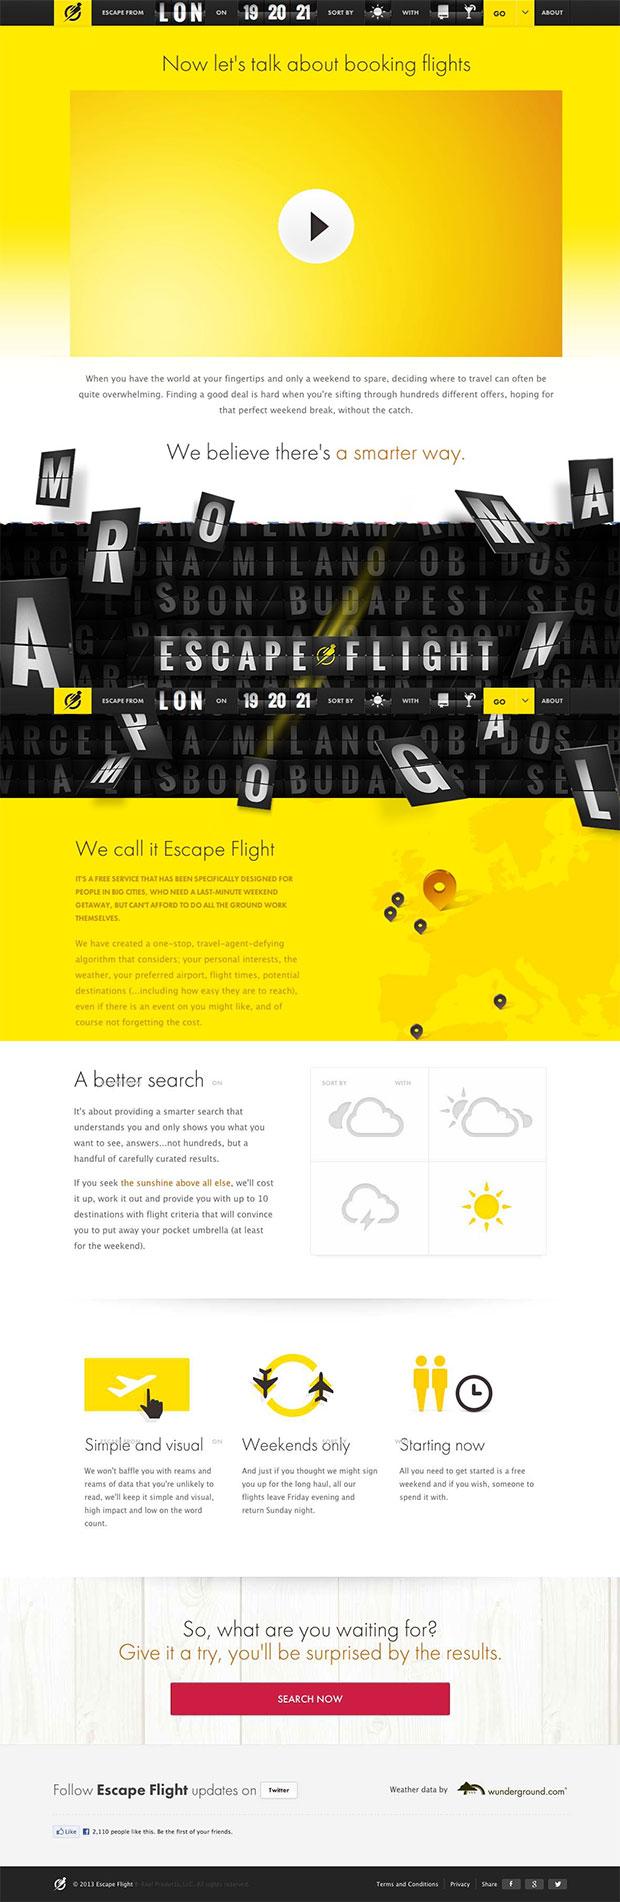 Escape-Flight